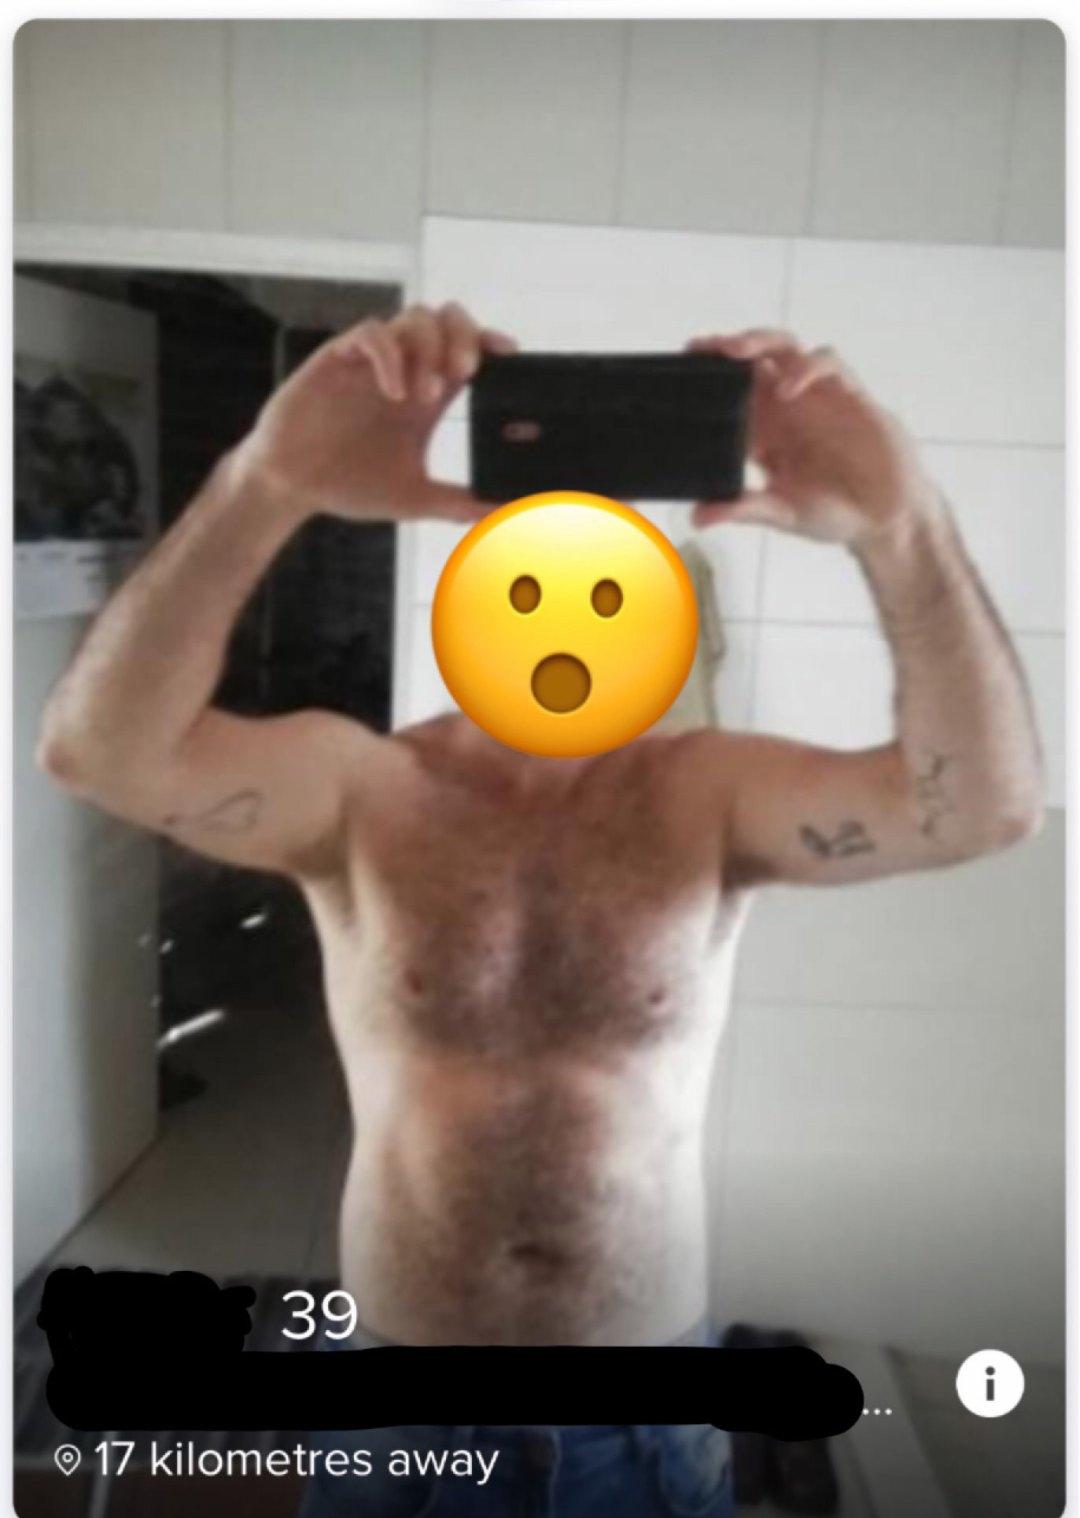 Tinder profile bare chest selfie.